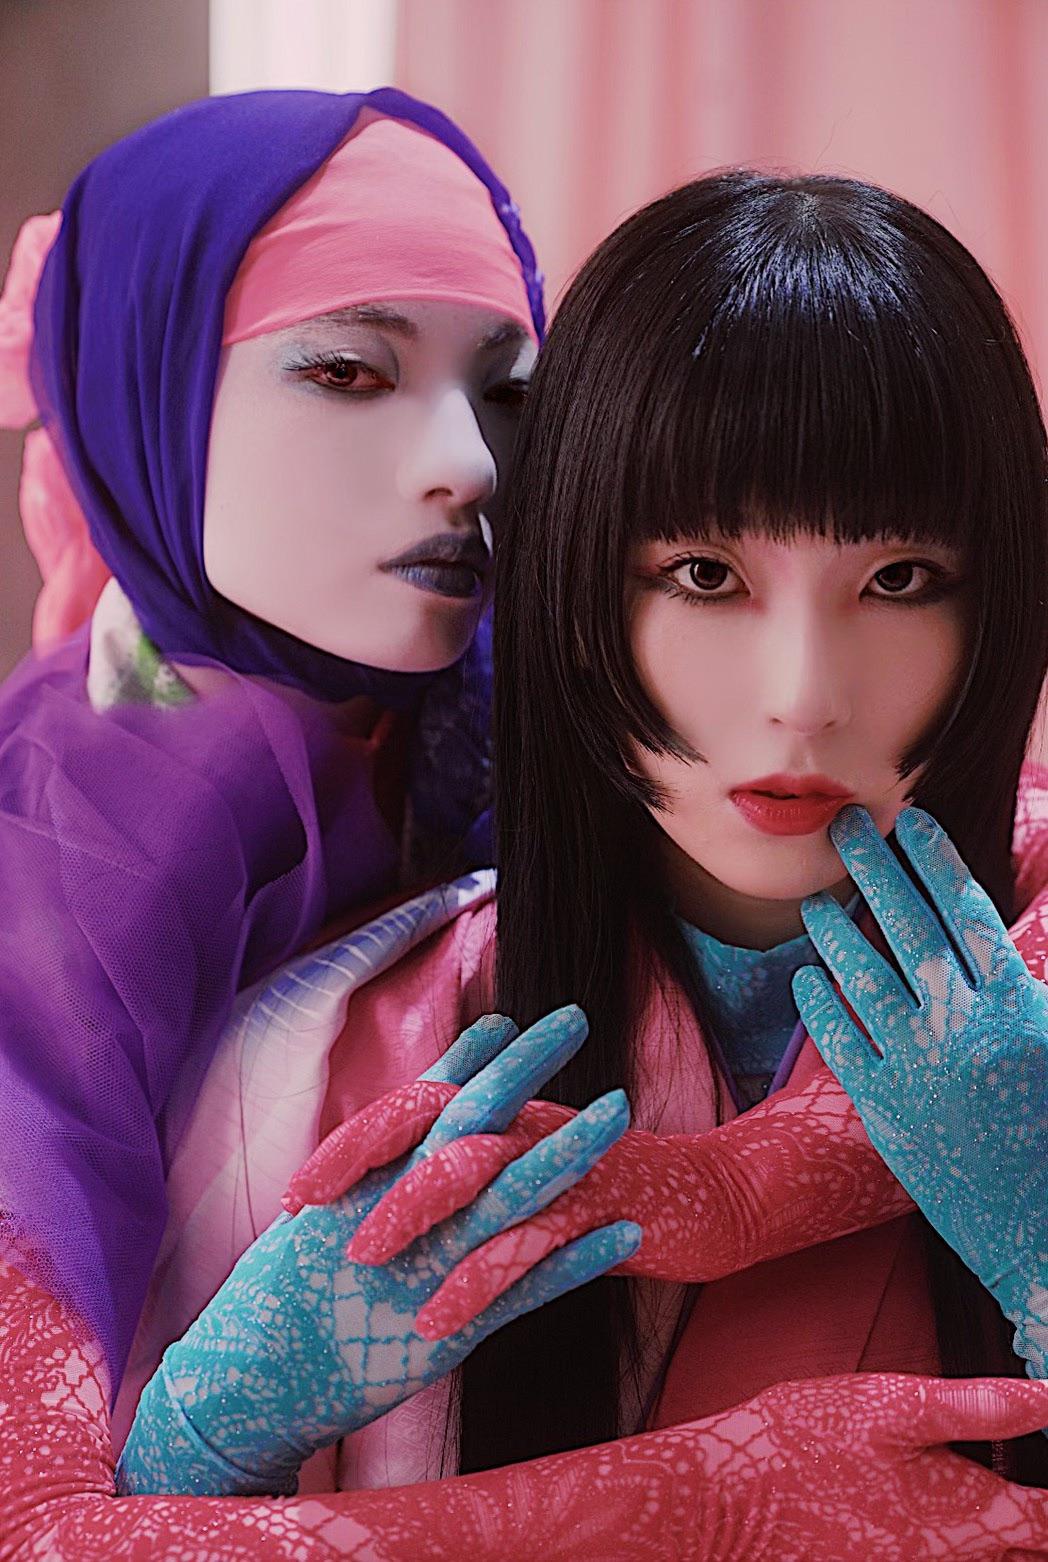 daokoヤマダアオイ_ダヲアオヨロズショップ_資生堂BeautySquare.